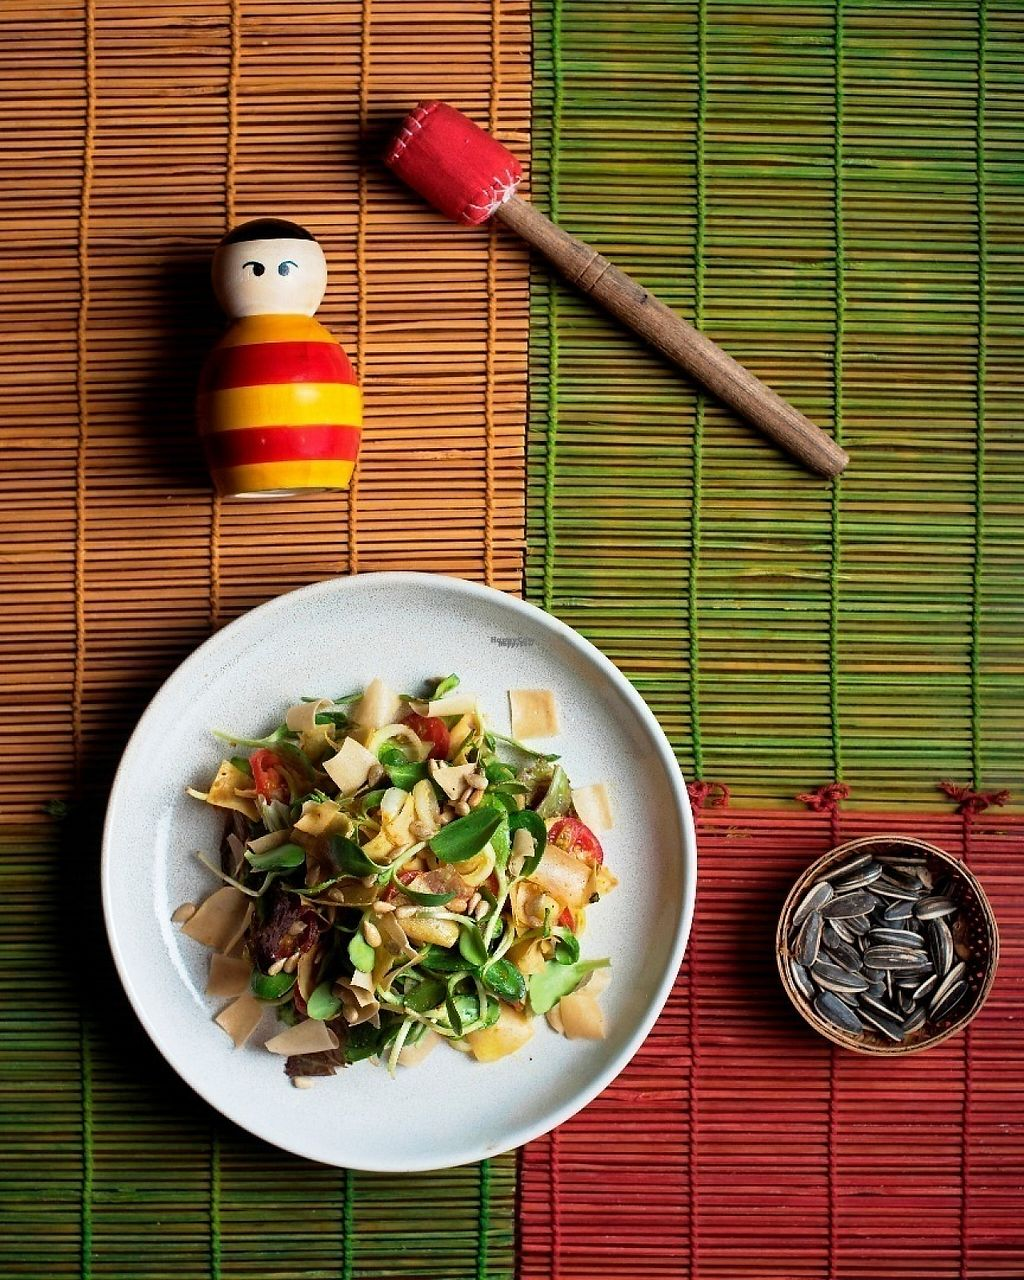 "Photo of Burma Burma  by <a href=""/members/profile/ankitburmaburma"">ankitburmaburma</a> <br/>Sunflower Leaves and Crispy Wheat Flakes Salad <br/> March 17, 2017  - <a href='/contact/abuse/image/50957/237362'>Report</a>"